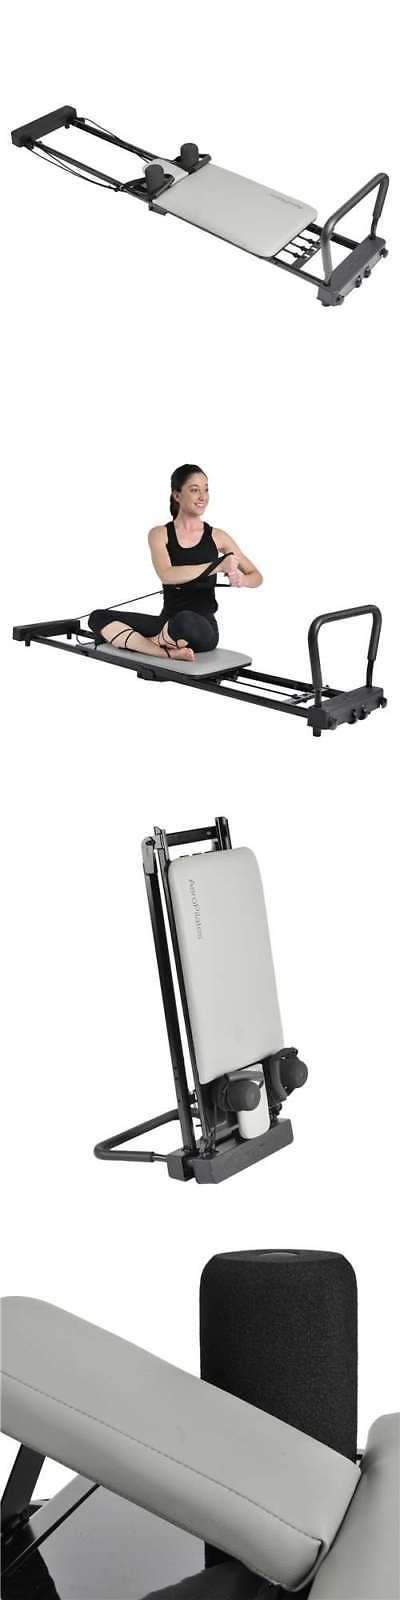 Pilates Tables 179807 Stamina Aeropilates 287 Folding Pilates Workout Reformer Machine Open Box Buy It Now Onl Pilates Workout Pilates Pilates Reformer